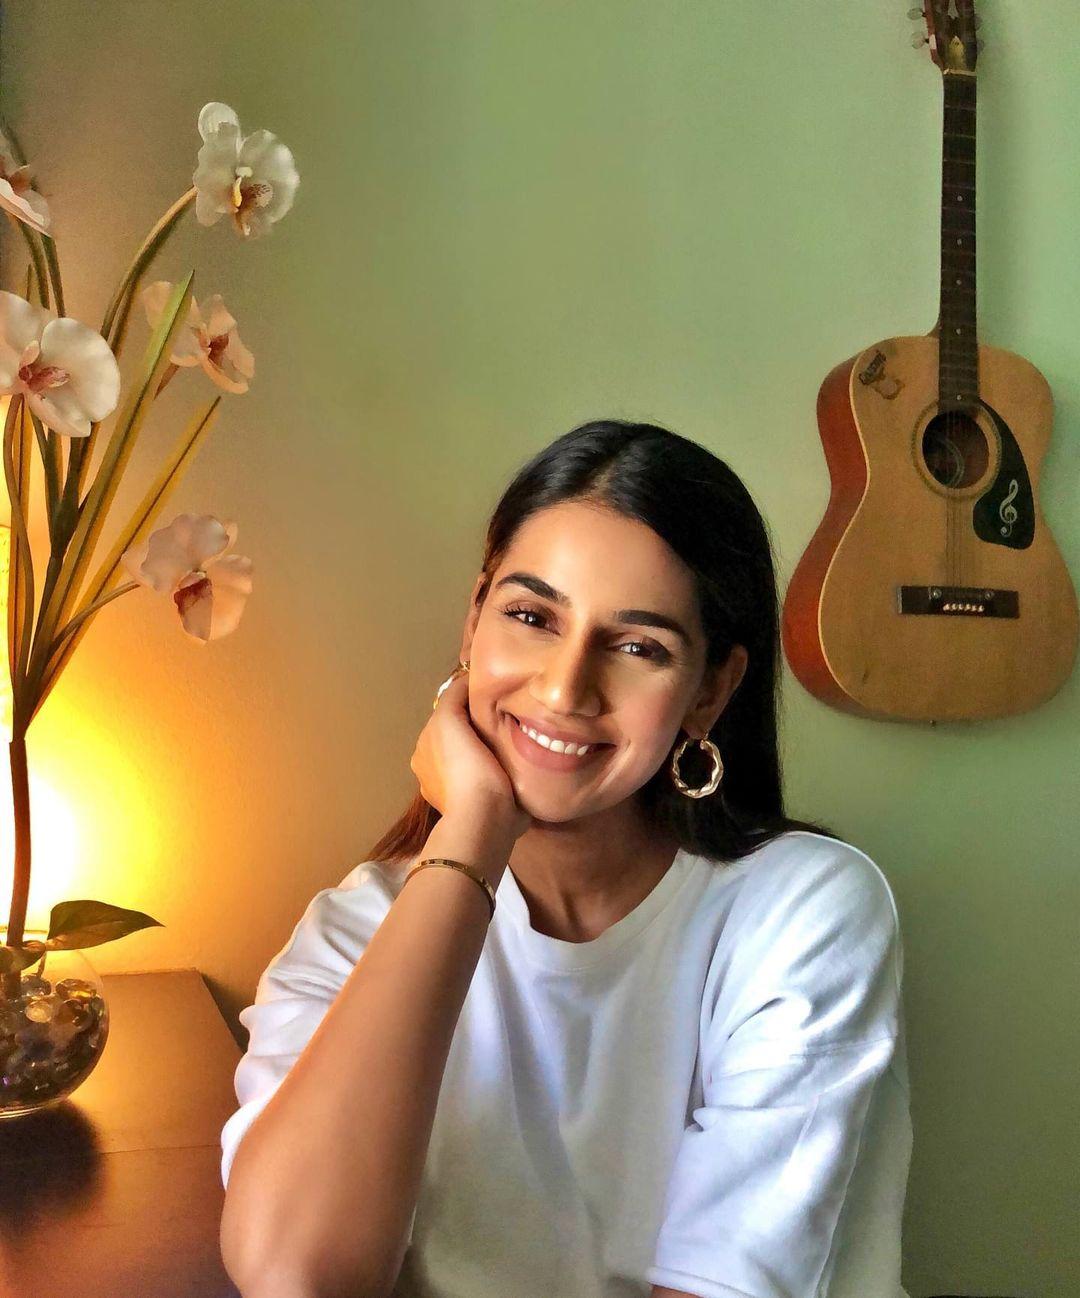 Sanjana Ganesan Husband, Twitter, Success Story, Age, Net Worth, Career, House, Instagram, Body Measurements, Career and Parents